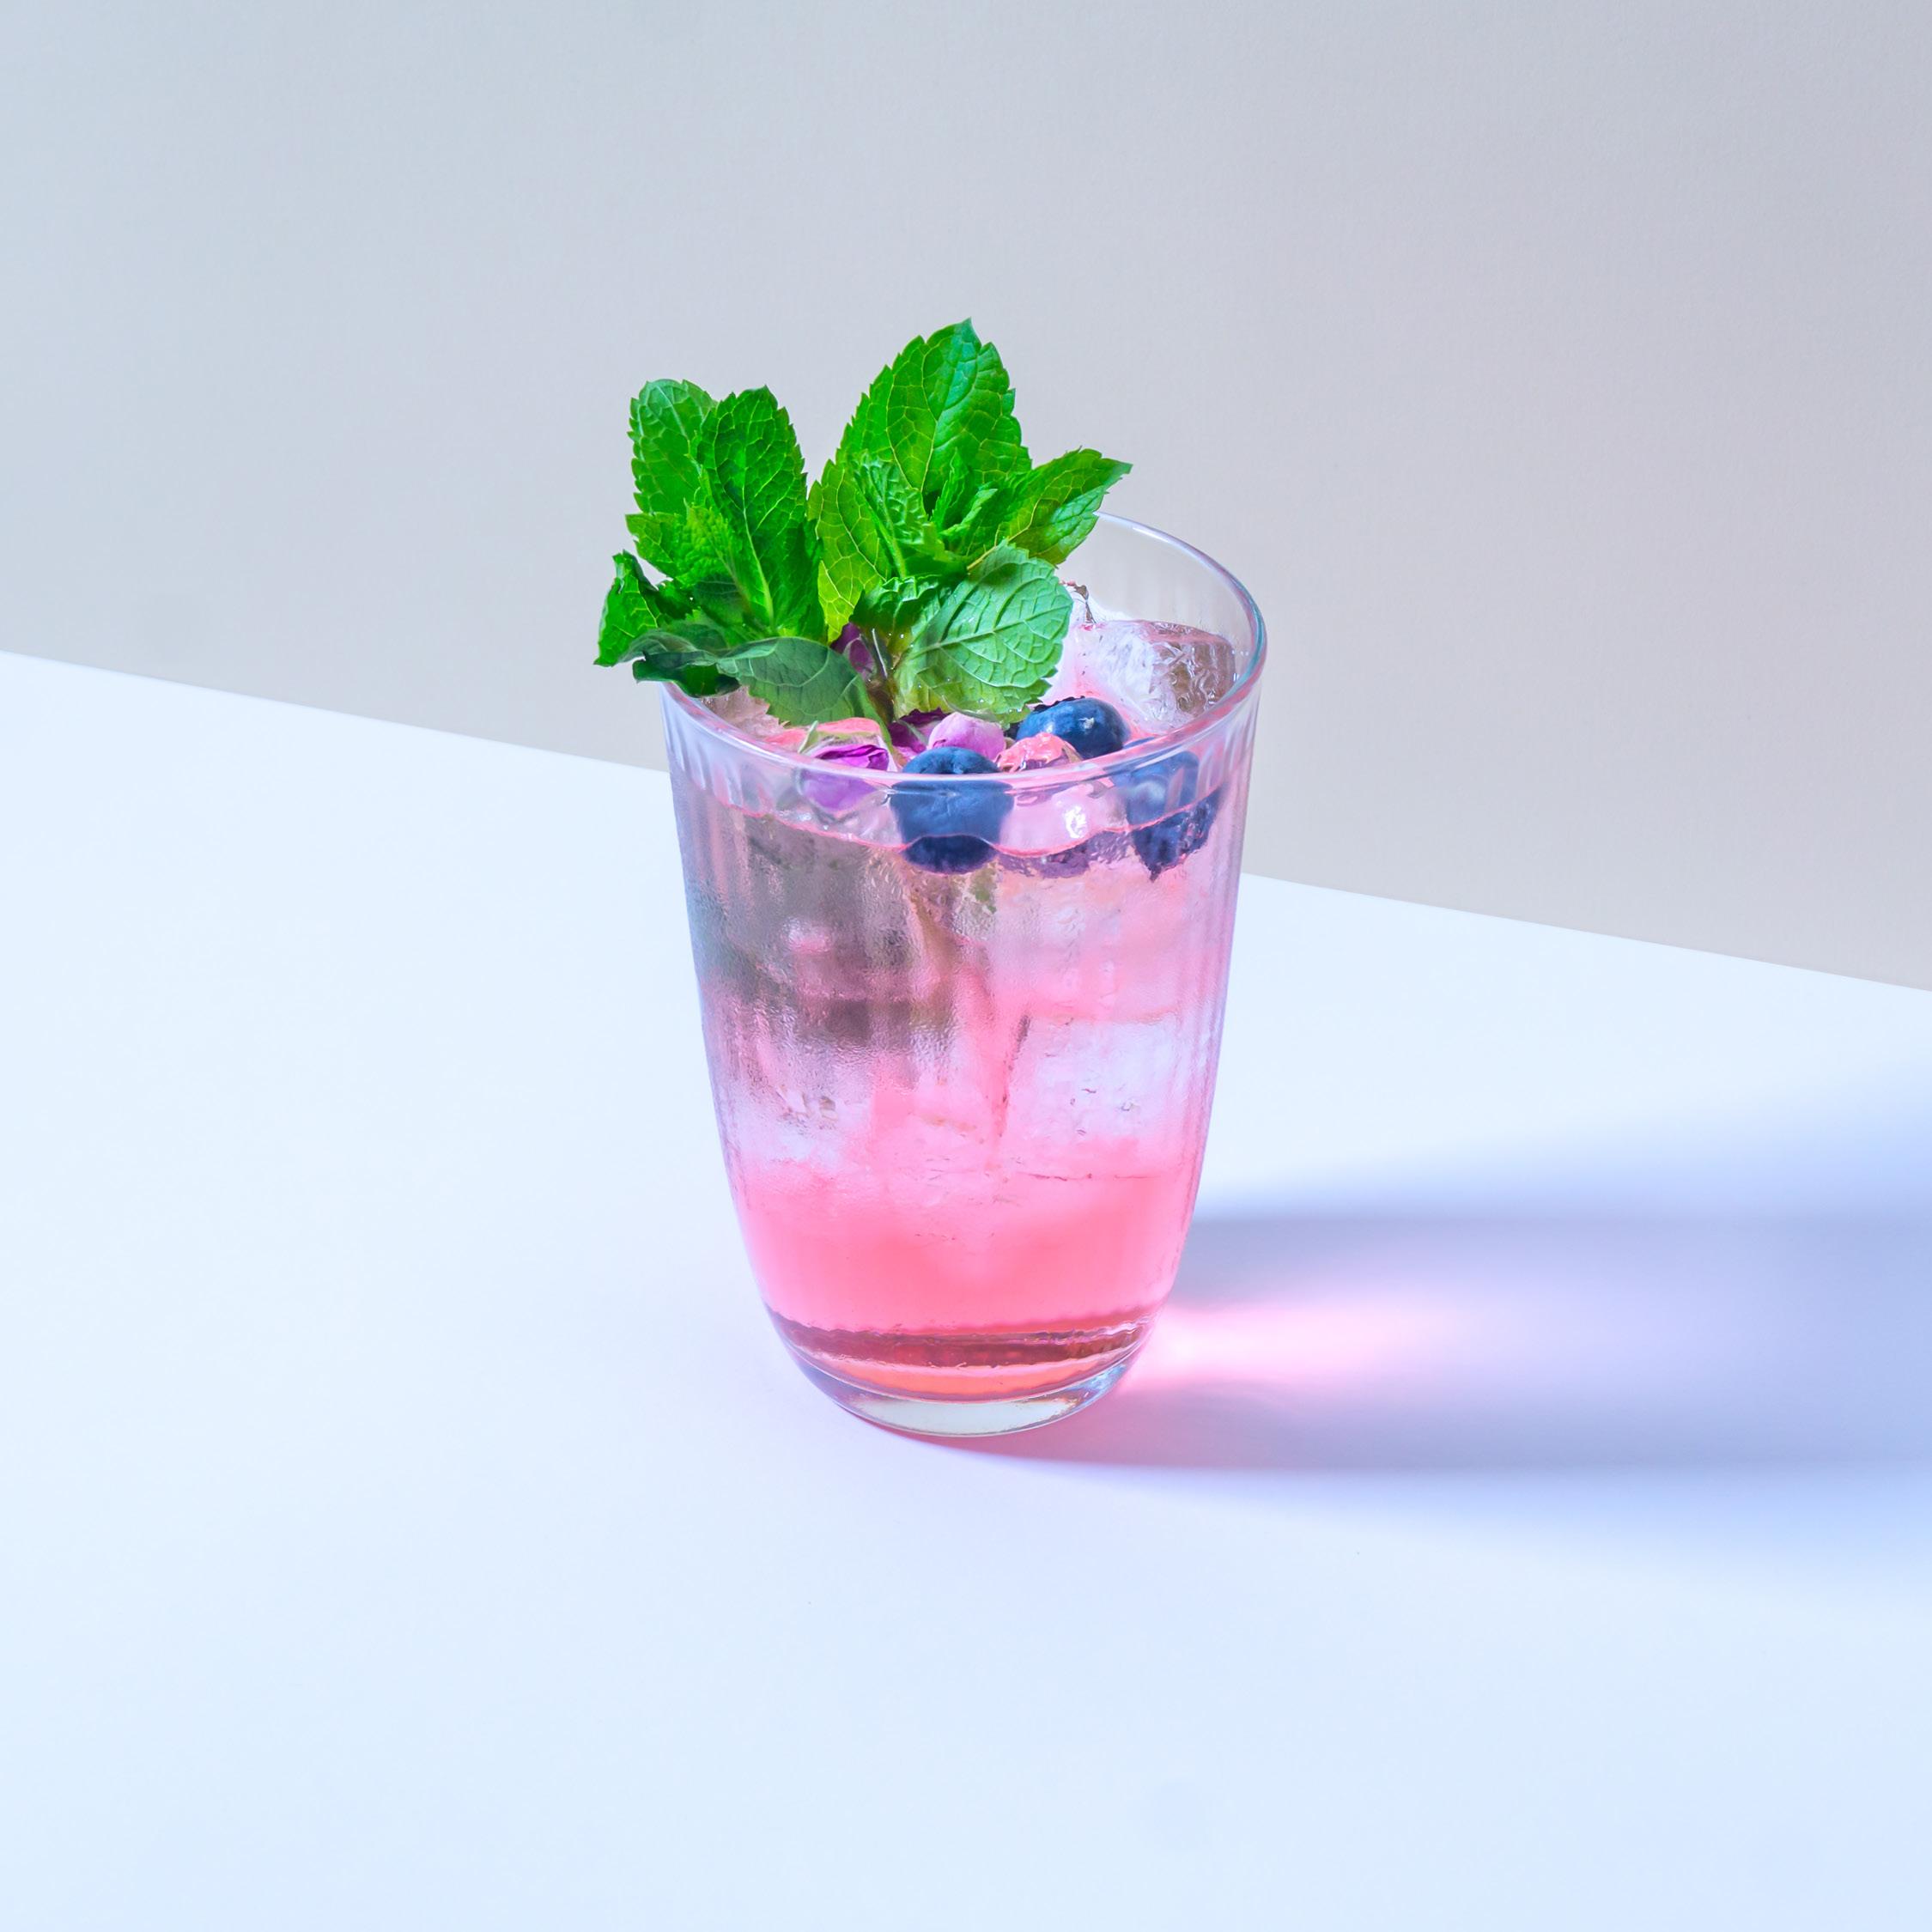 COPENHAGEN DESTILLAT AQUAVIT   mit Maulbeeren, Rosé und Dill mit Hibiskus Schweppes Premium Tonic.